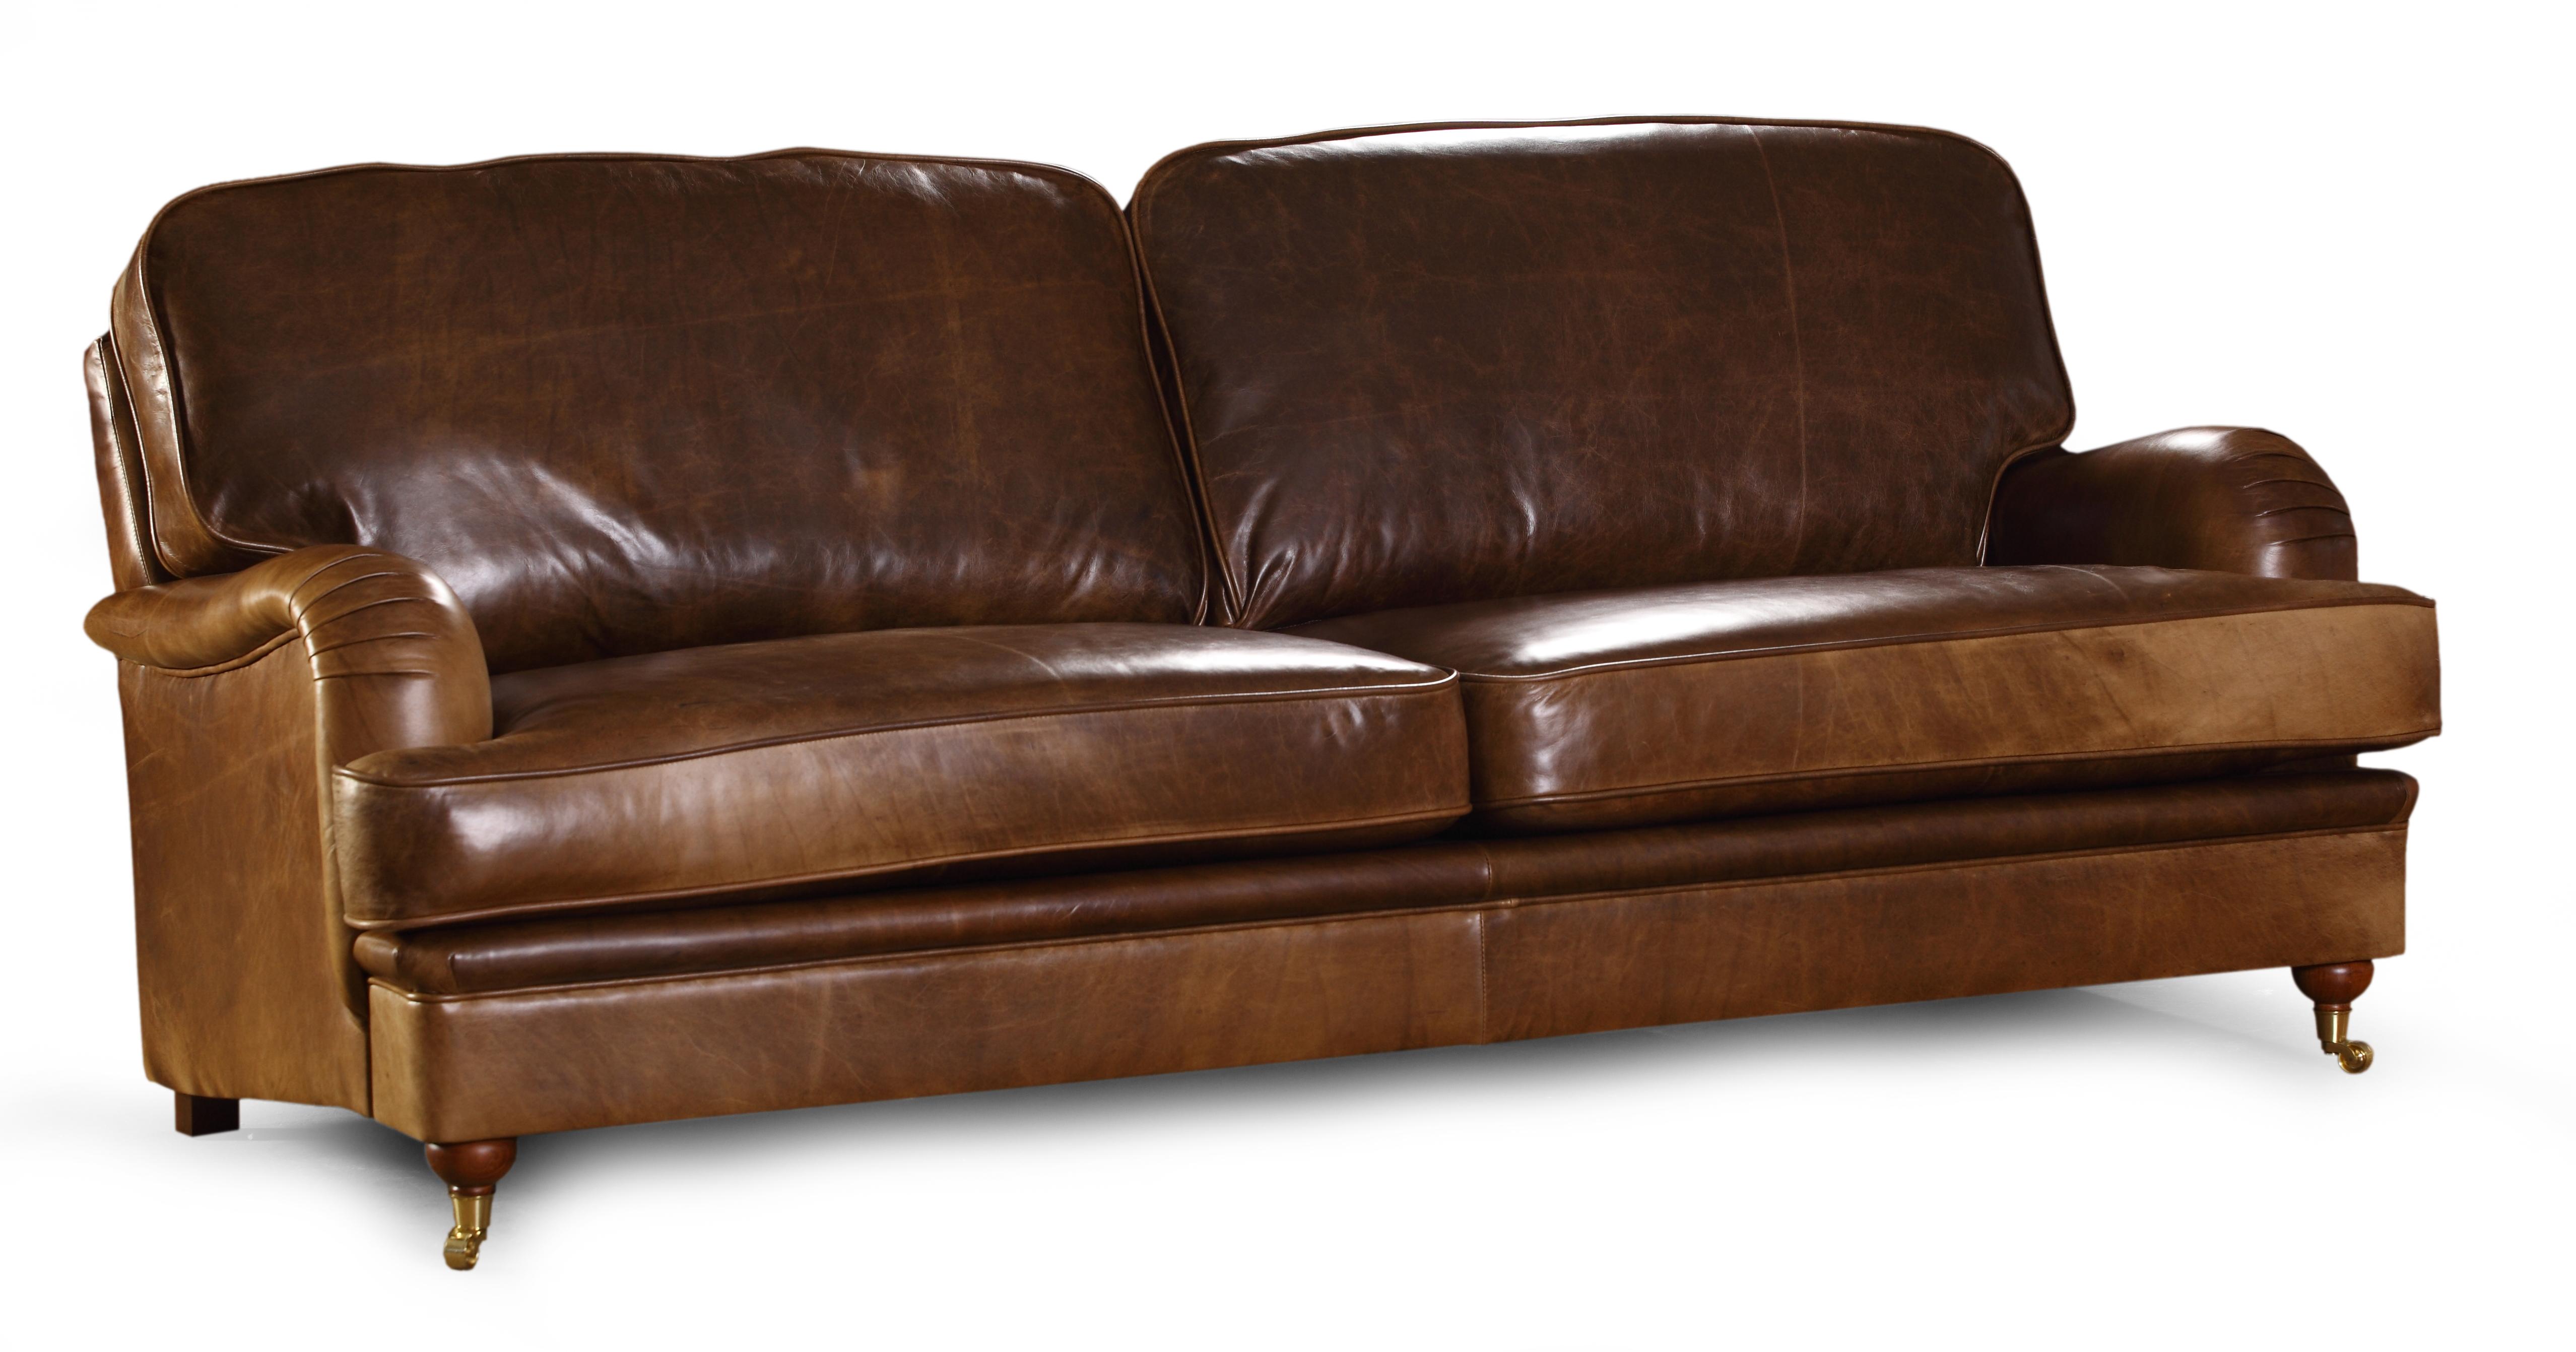 Canapea fixa 2 locuri Winston Lux - Resigilata